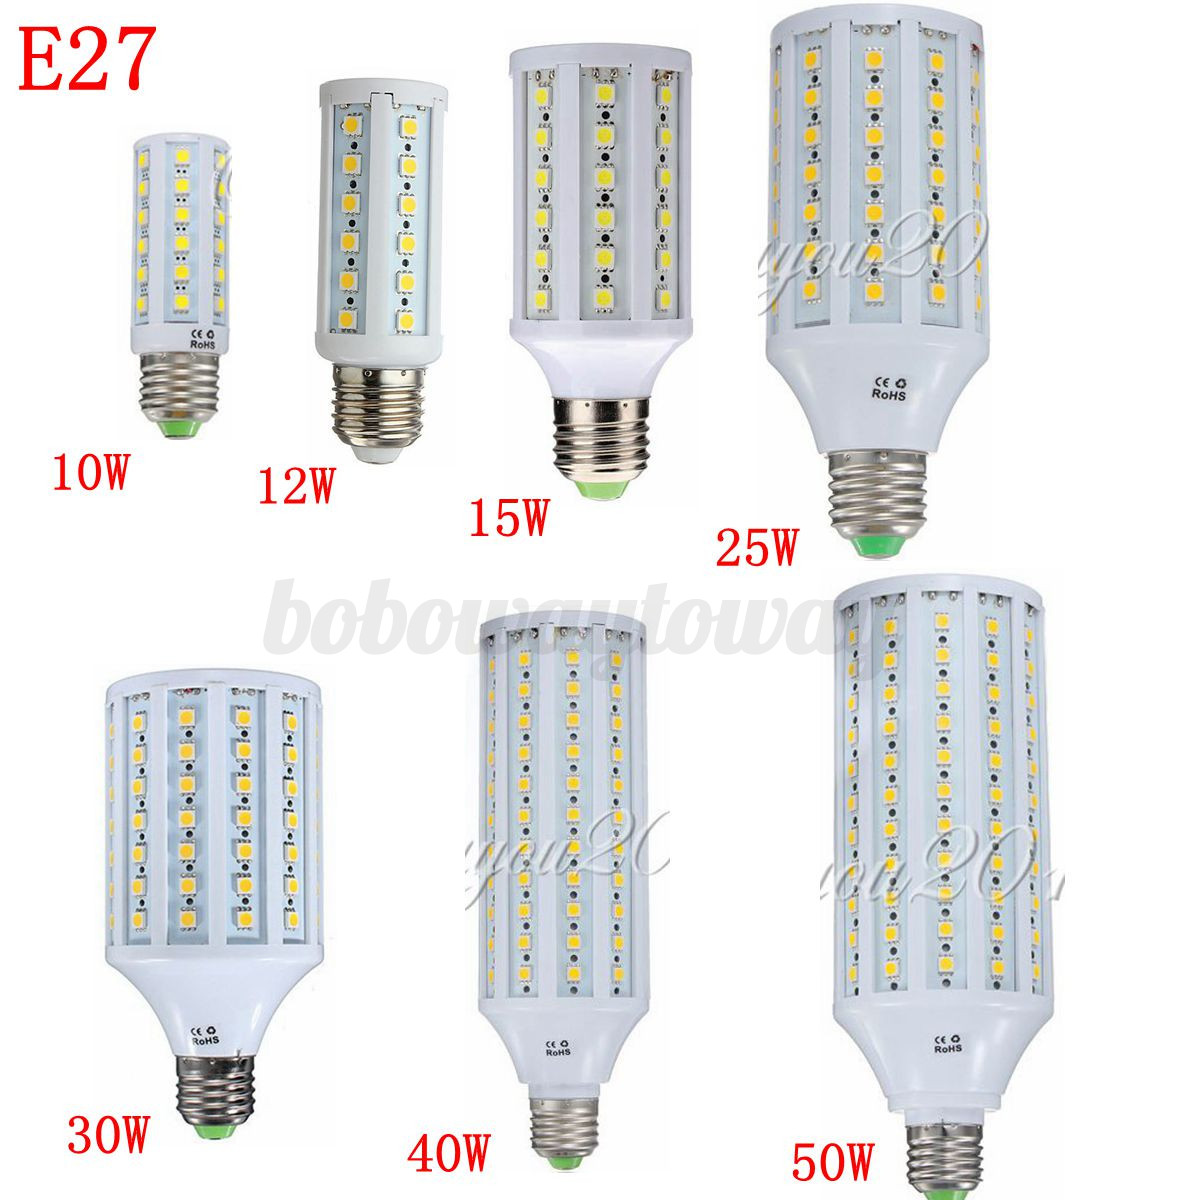 4/10X E27/E14/B22 5050 SMD 10W/15W/25W/30W/50W LED Corn Light Bulb Lamp Bulb